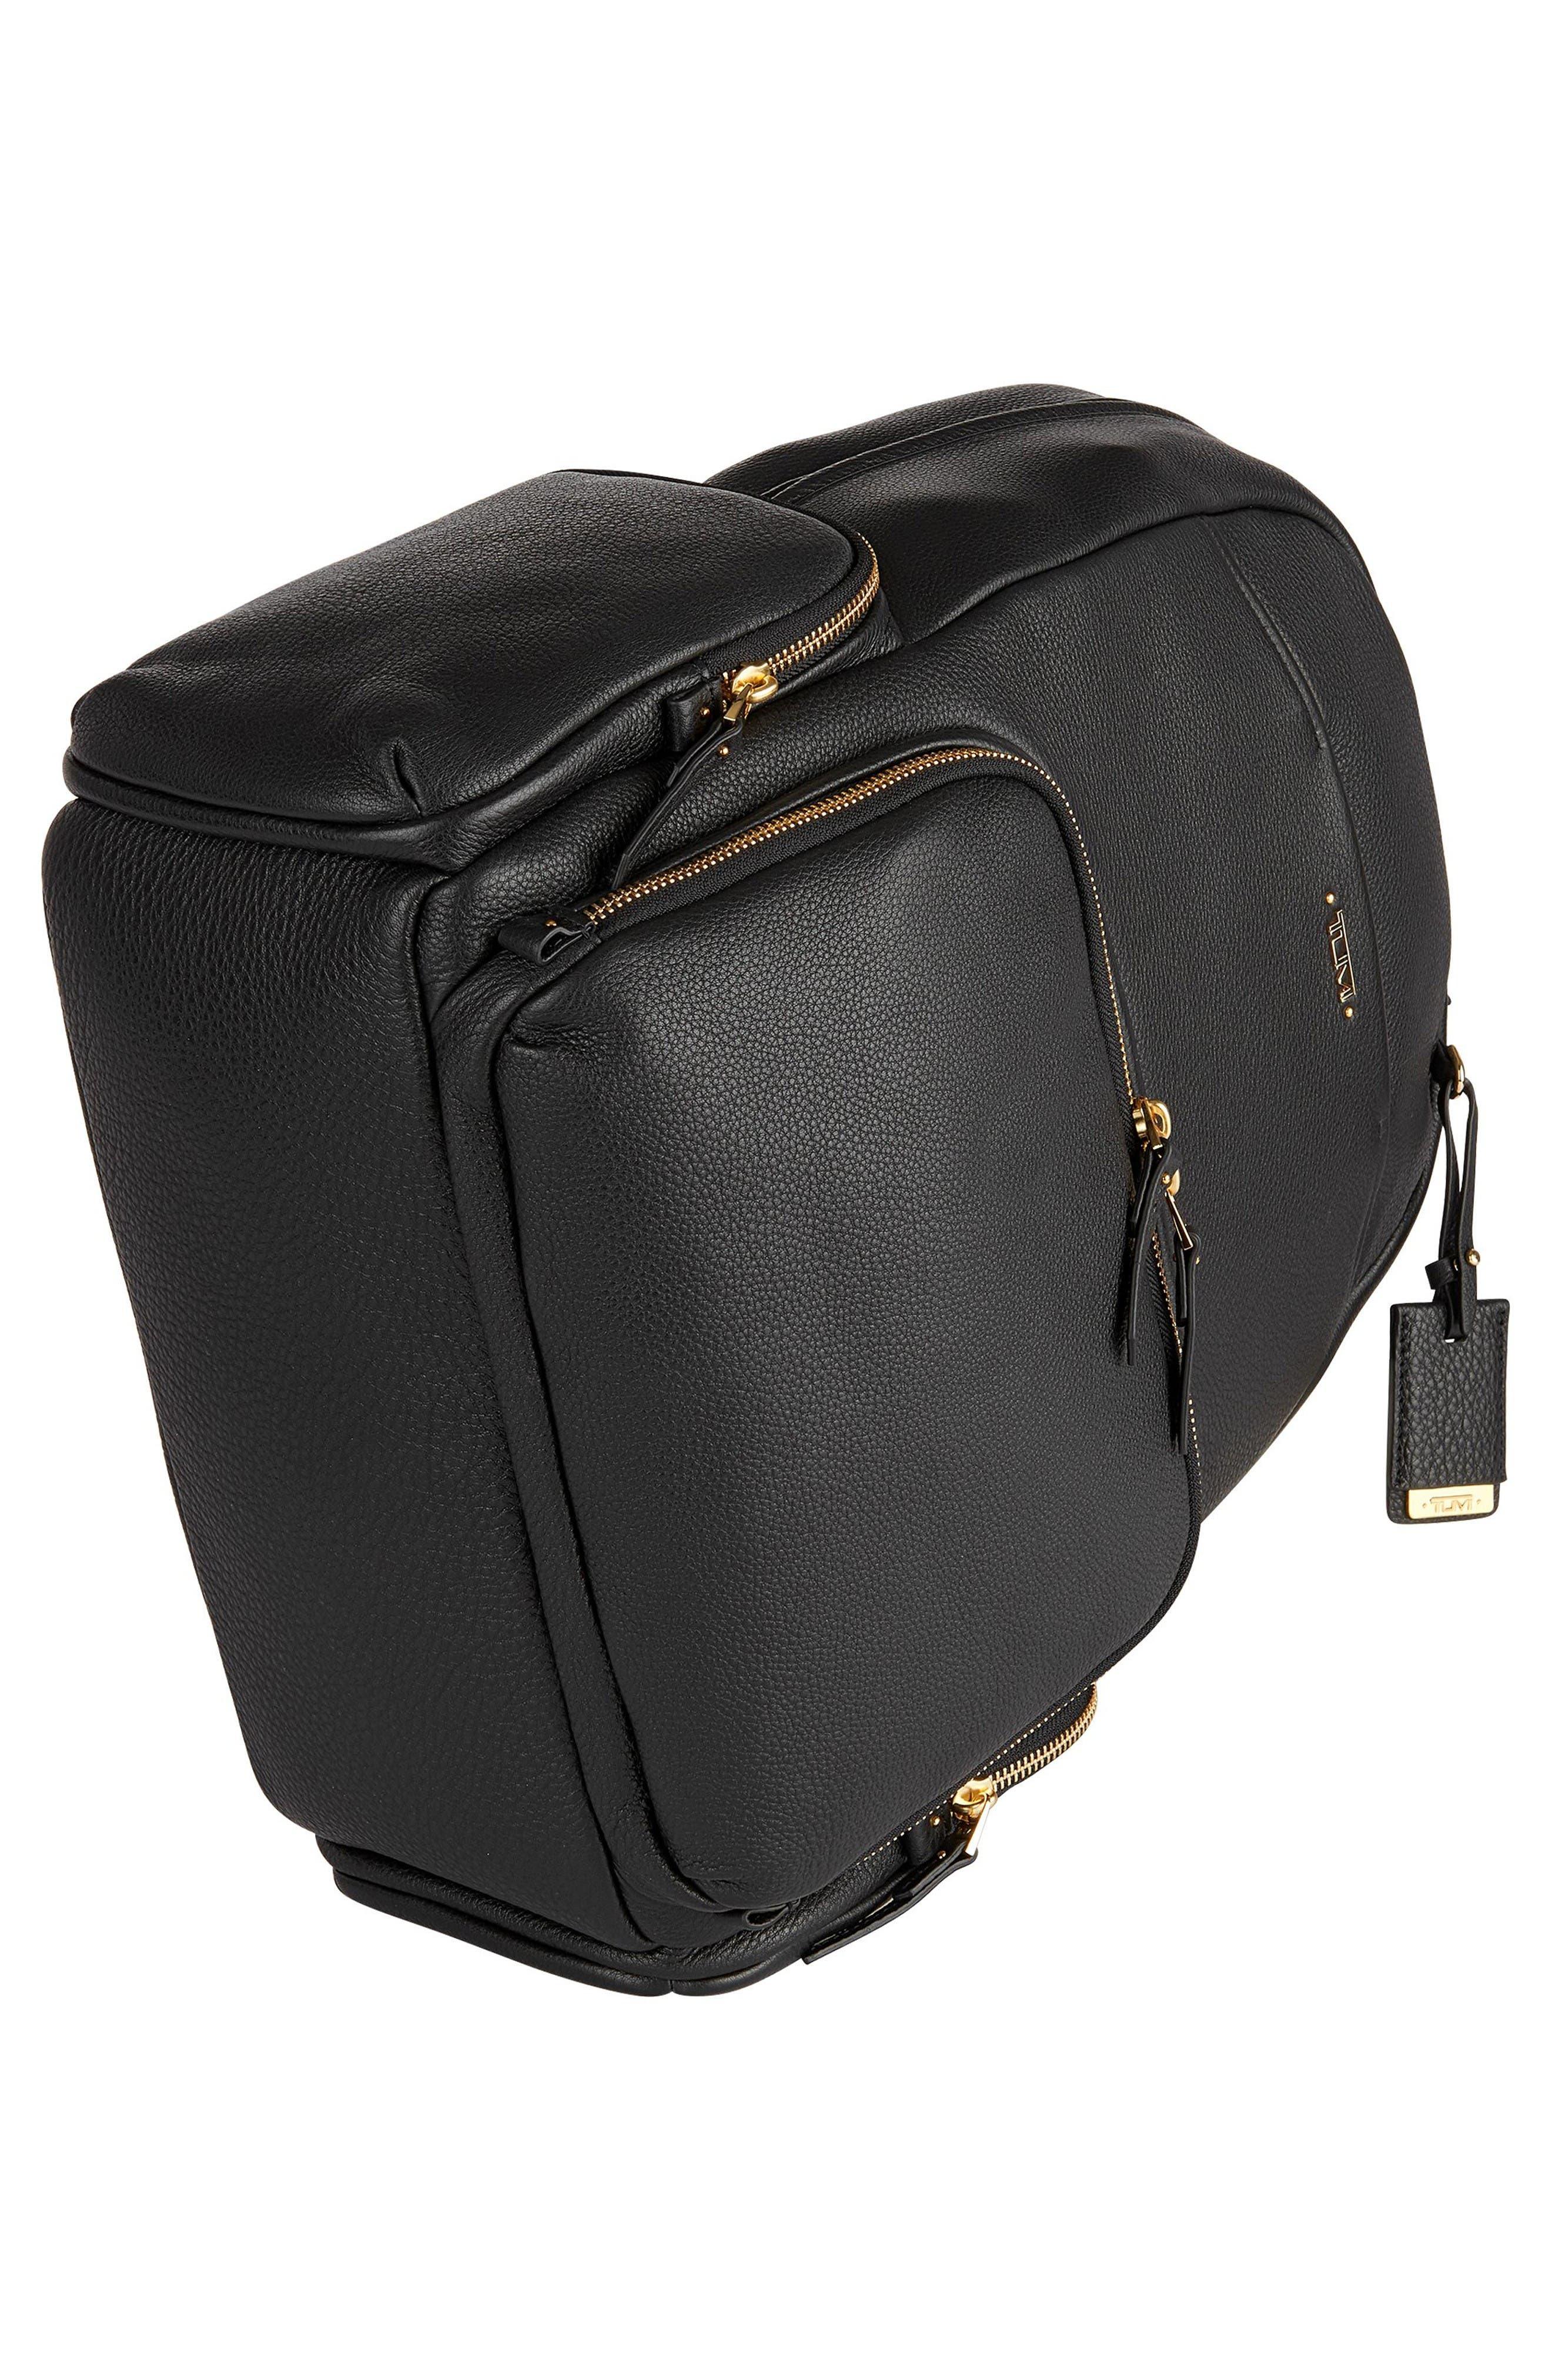 Calais Leather Computer Backpack,                             Alternate thumbnail 5, color,                             Black